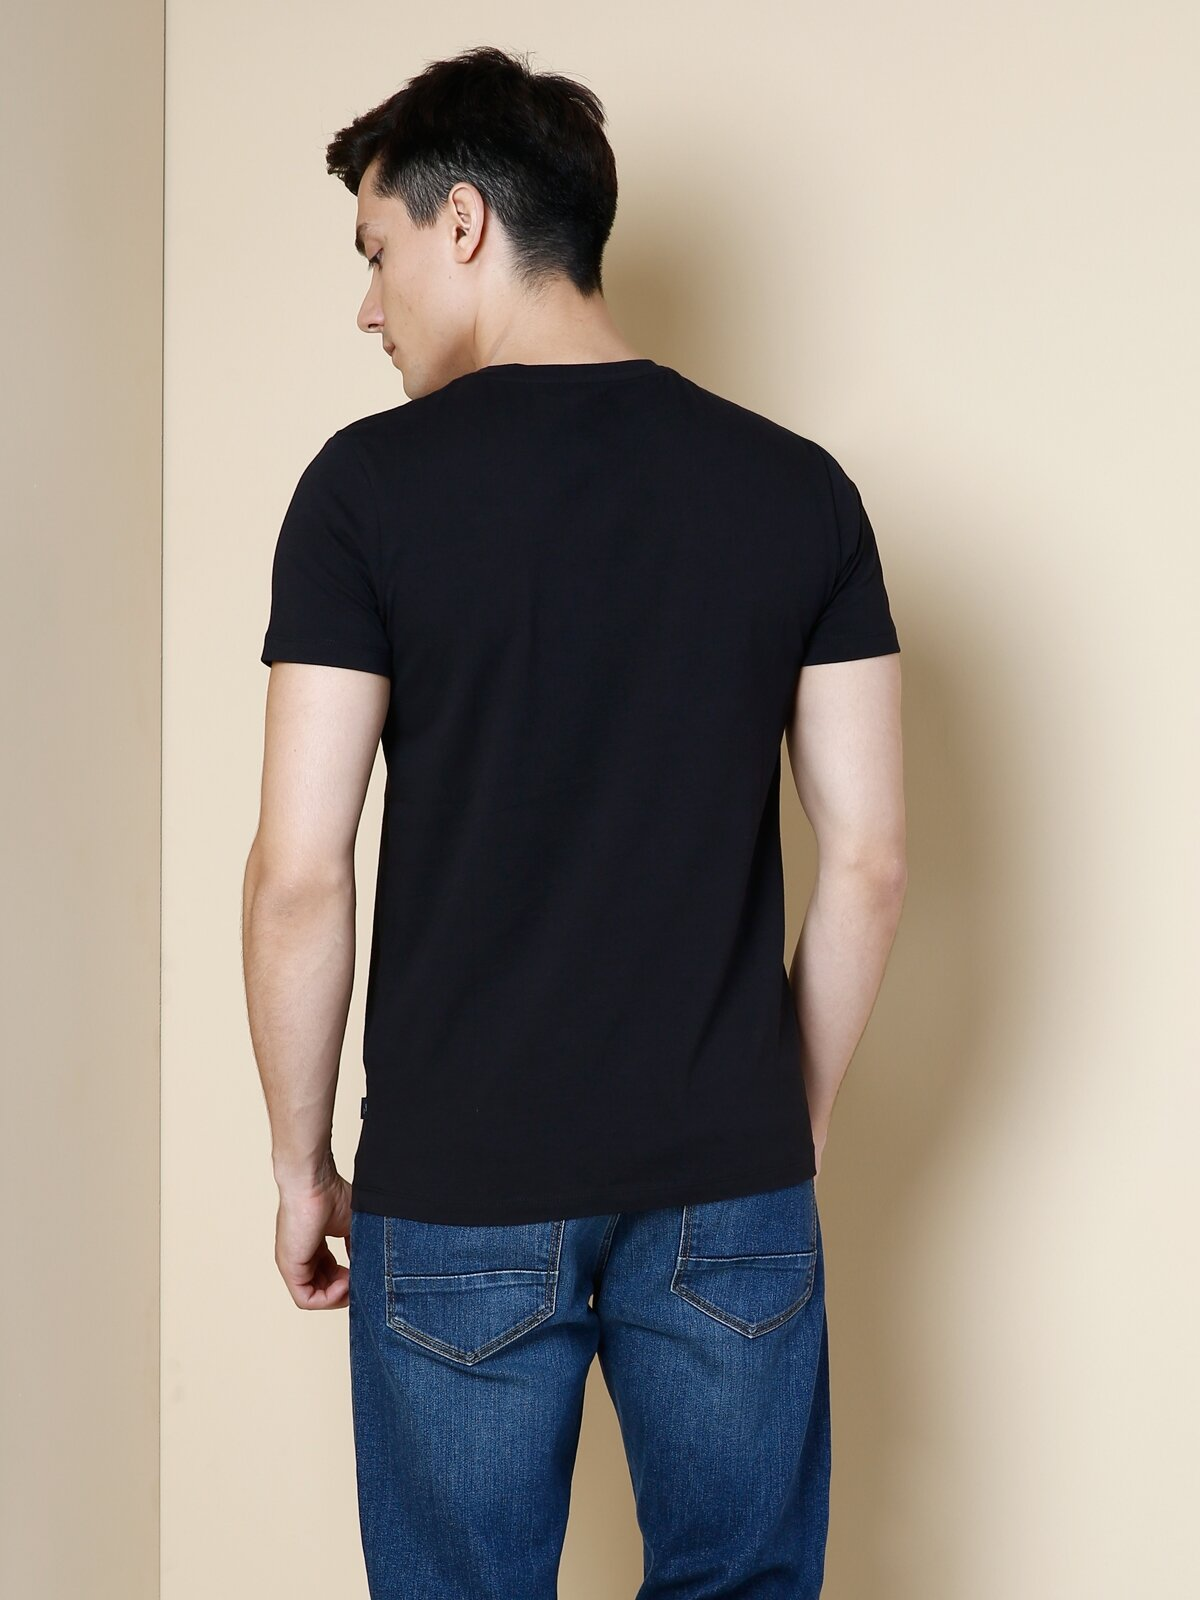 Siyah Bisiklet Yaka Kısa Kol Tişört